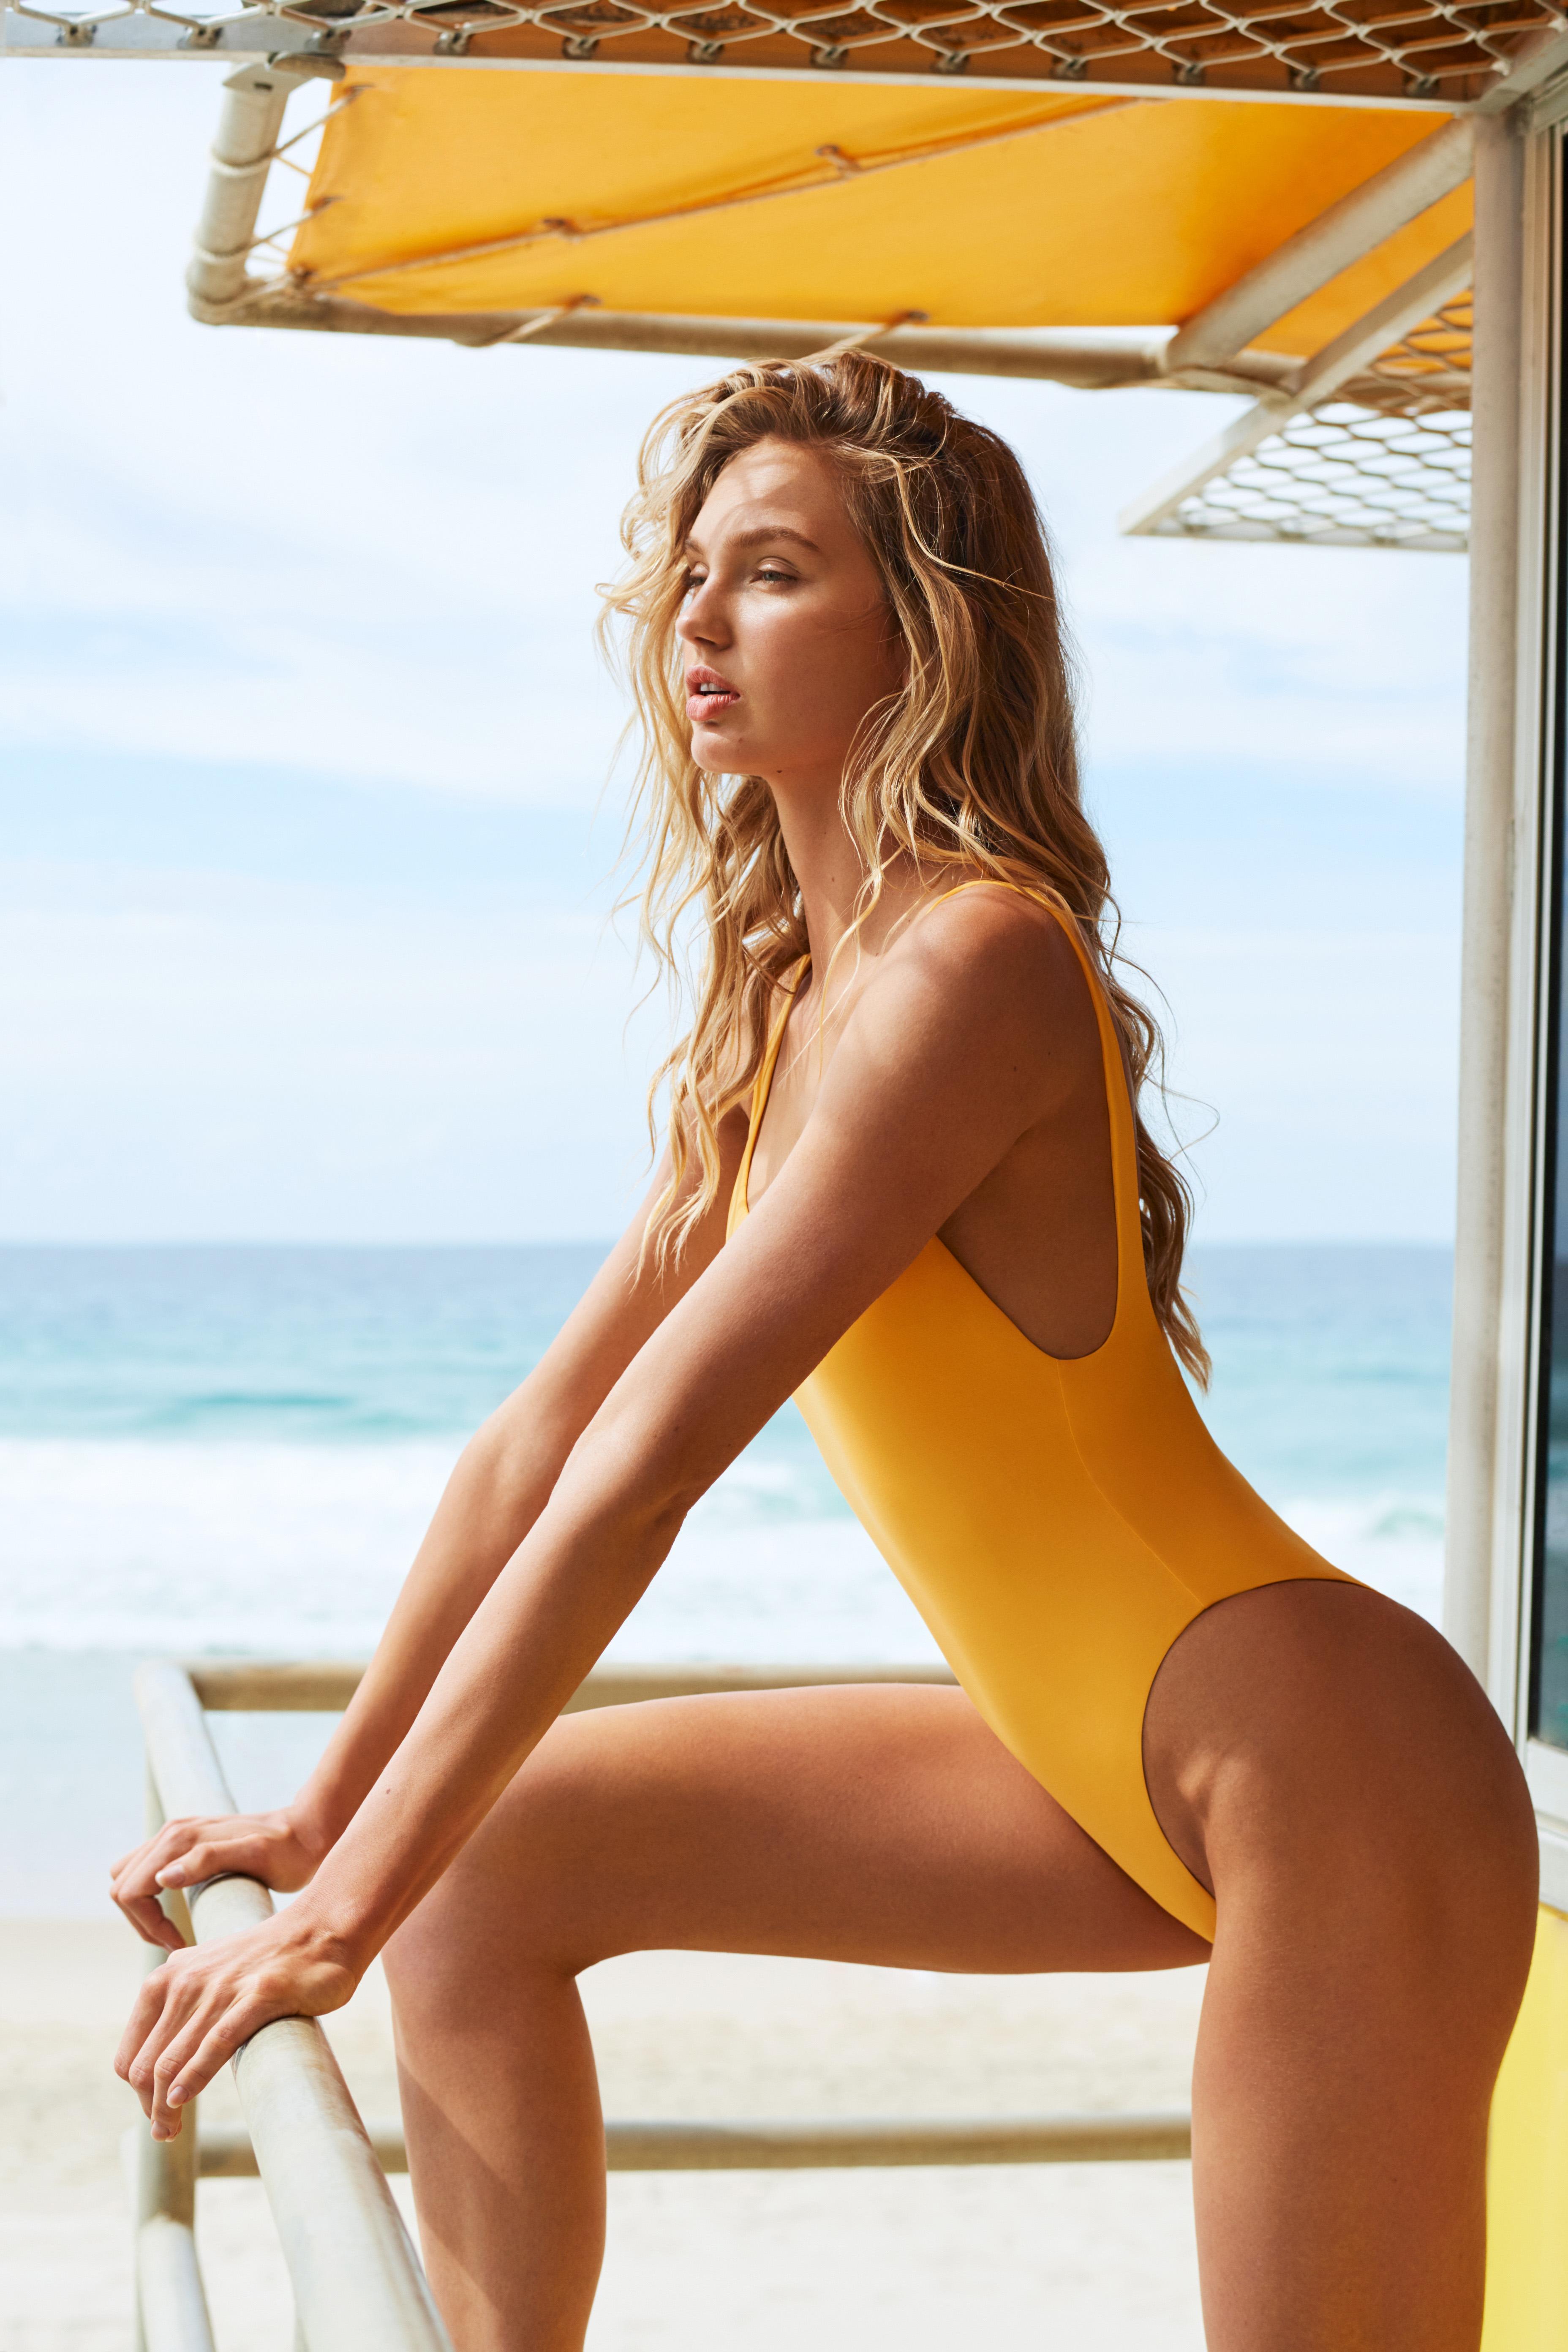 eefe804037 Swimsuit supermodel Romee Strijd reveals her swimsuit body routine